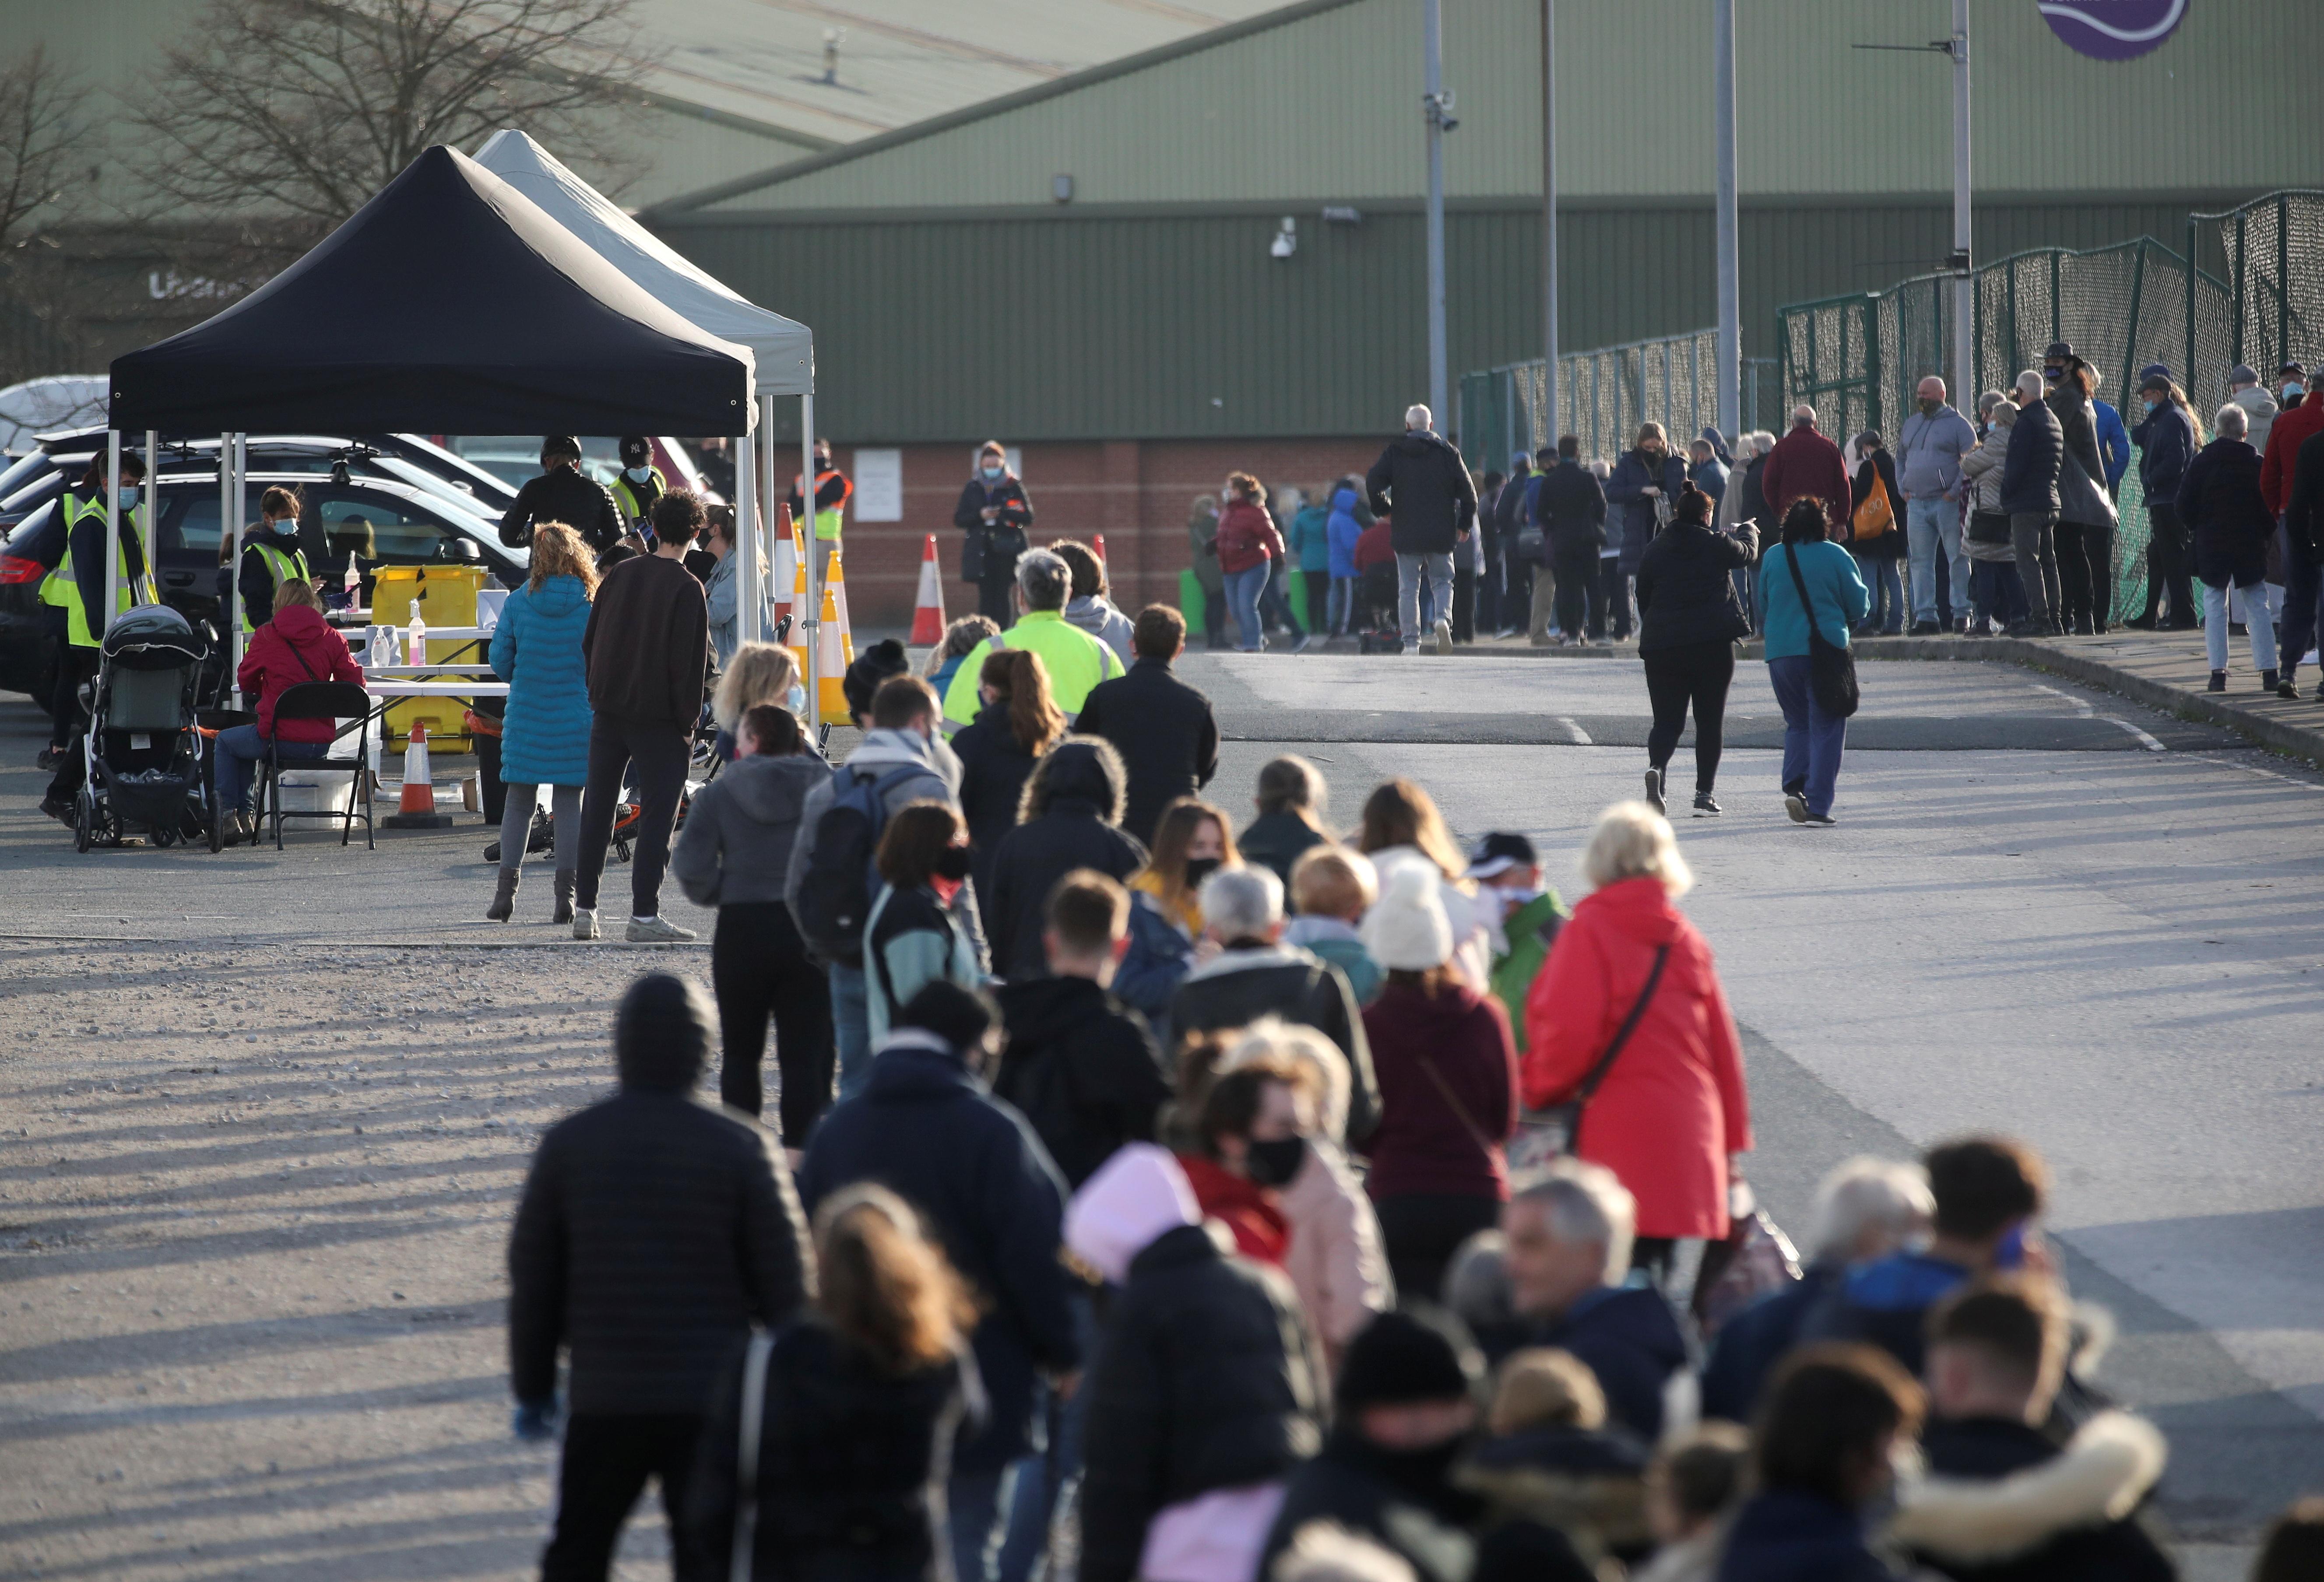 People queue at the coronavirus disease (COVID-19) testing centre in Liverpool, Britain November 6, 2020. REUTERS/Carl Recine